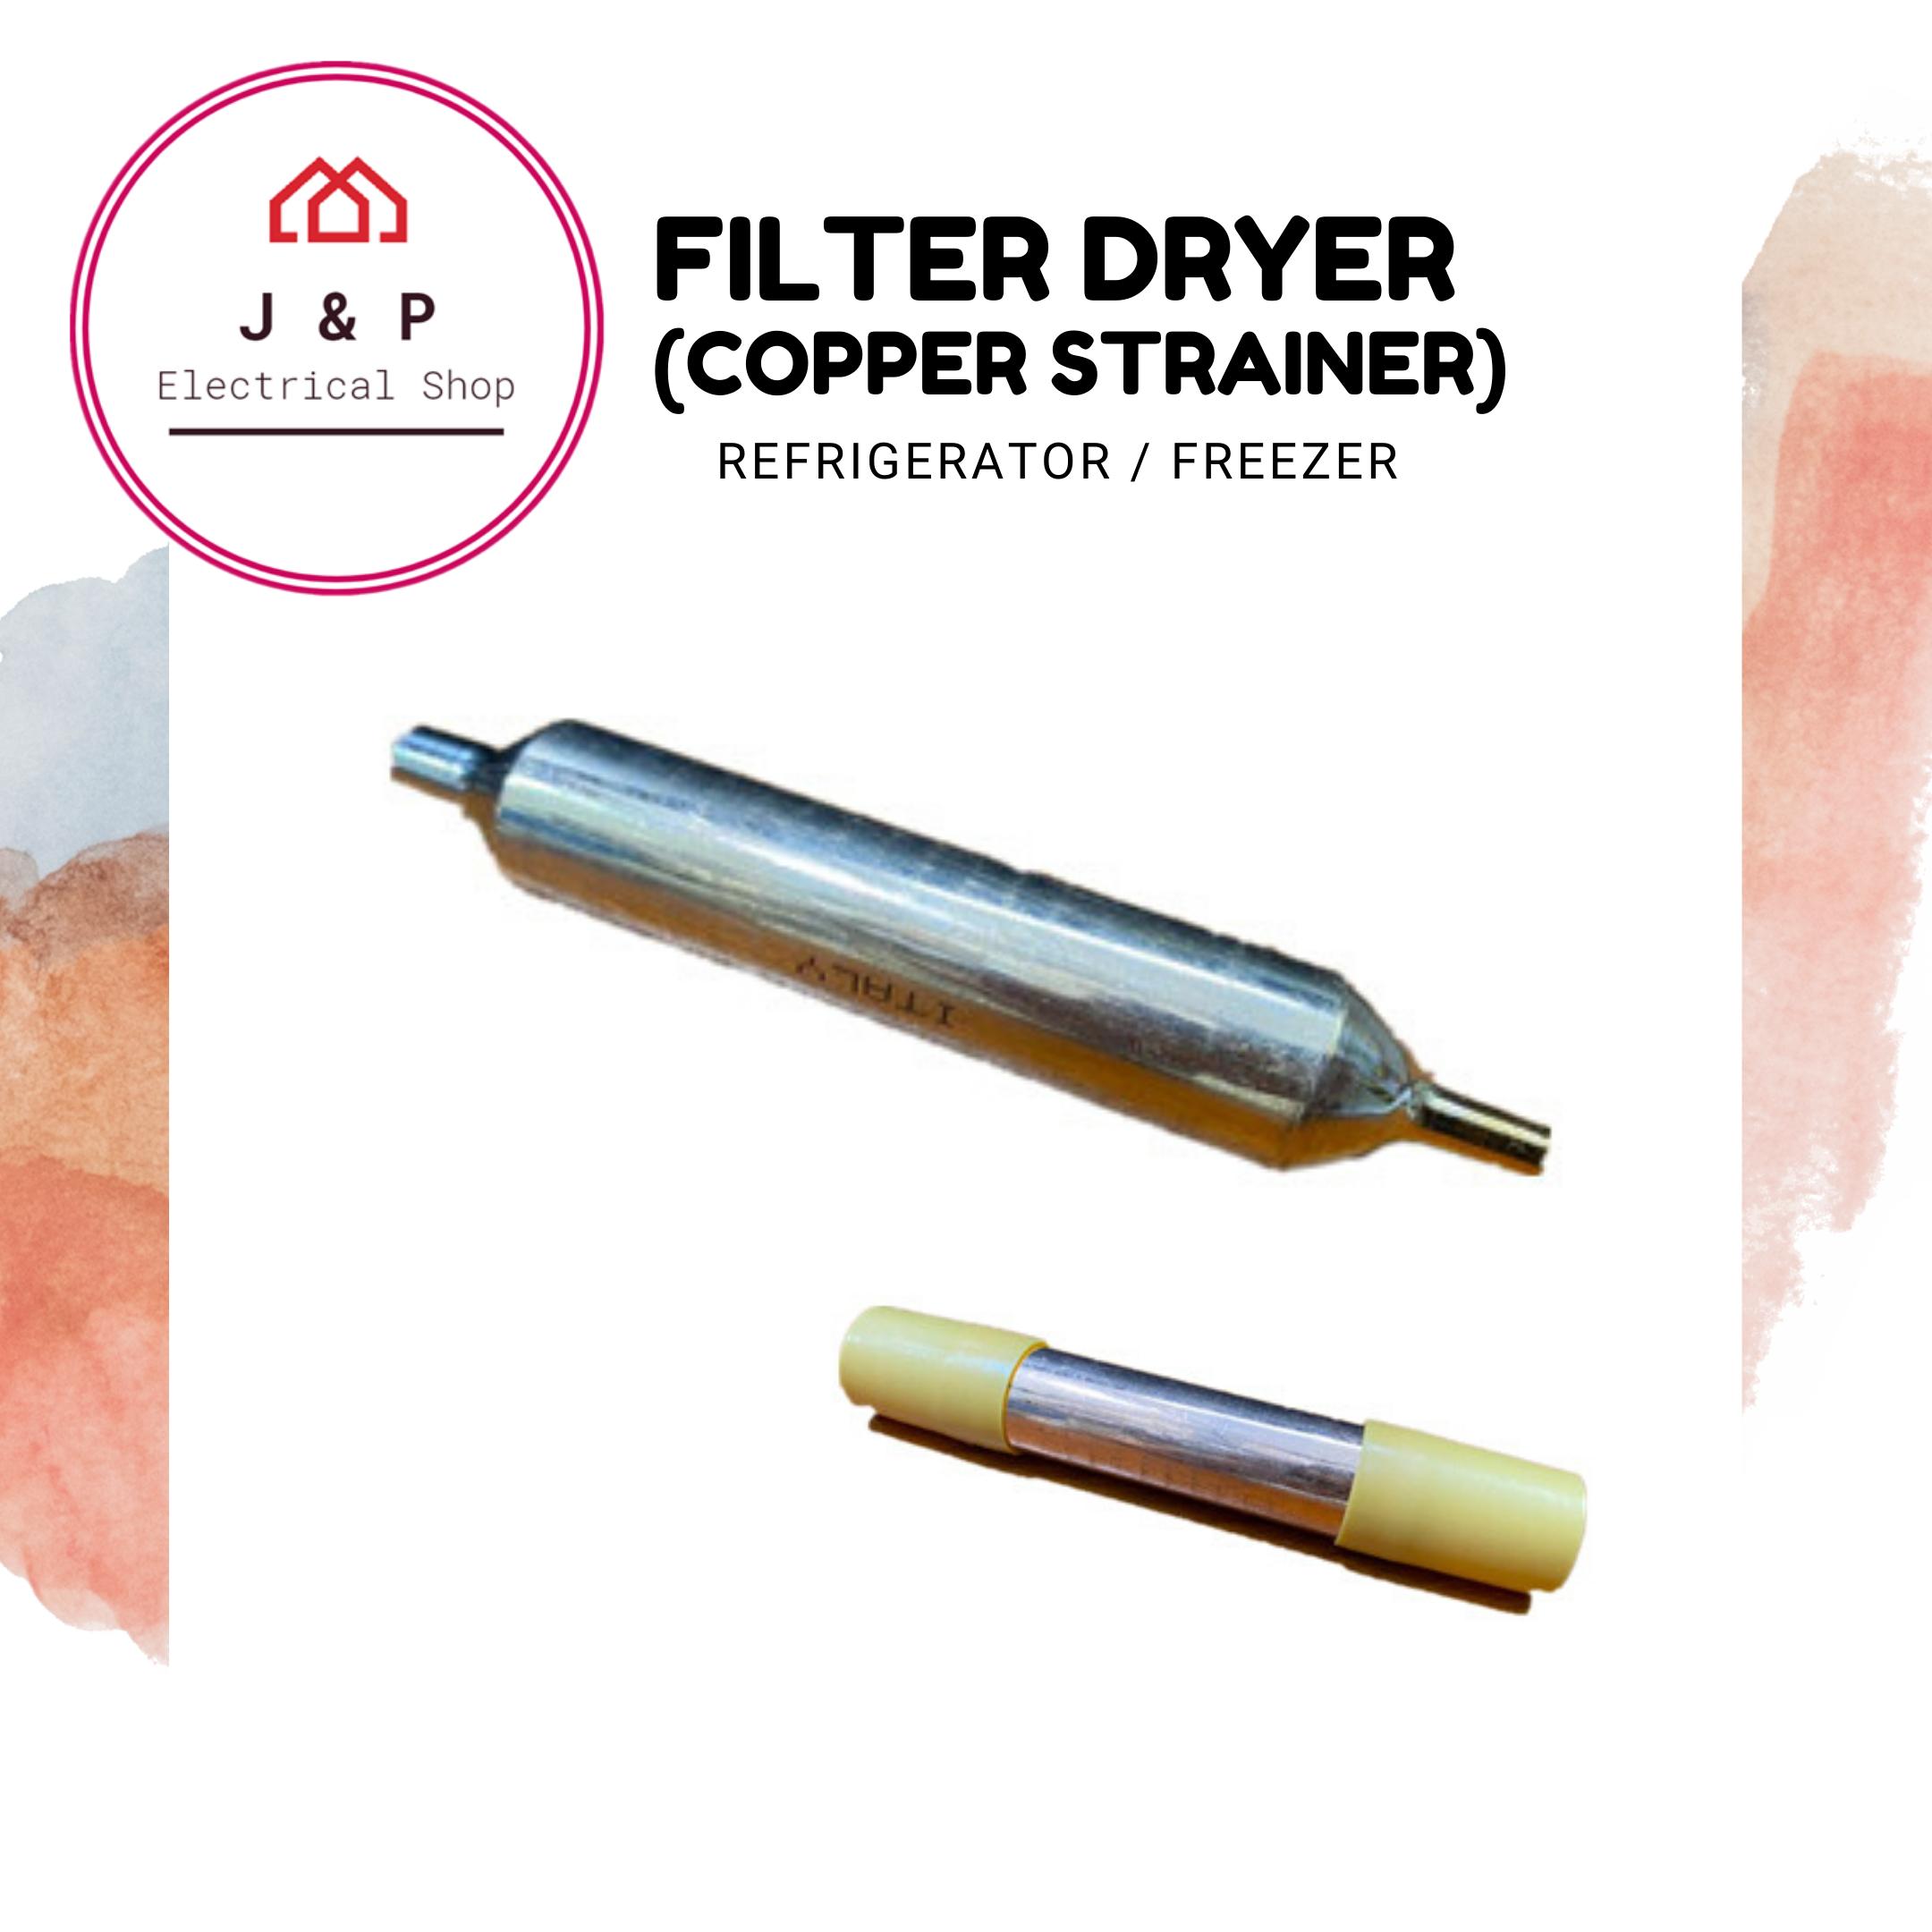 Filter Dryer (Copper Strainer) for Refrigerator / Freezer [ READY STOCK]1357538073-1597912814365-0